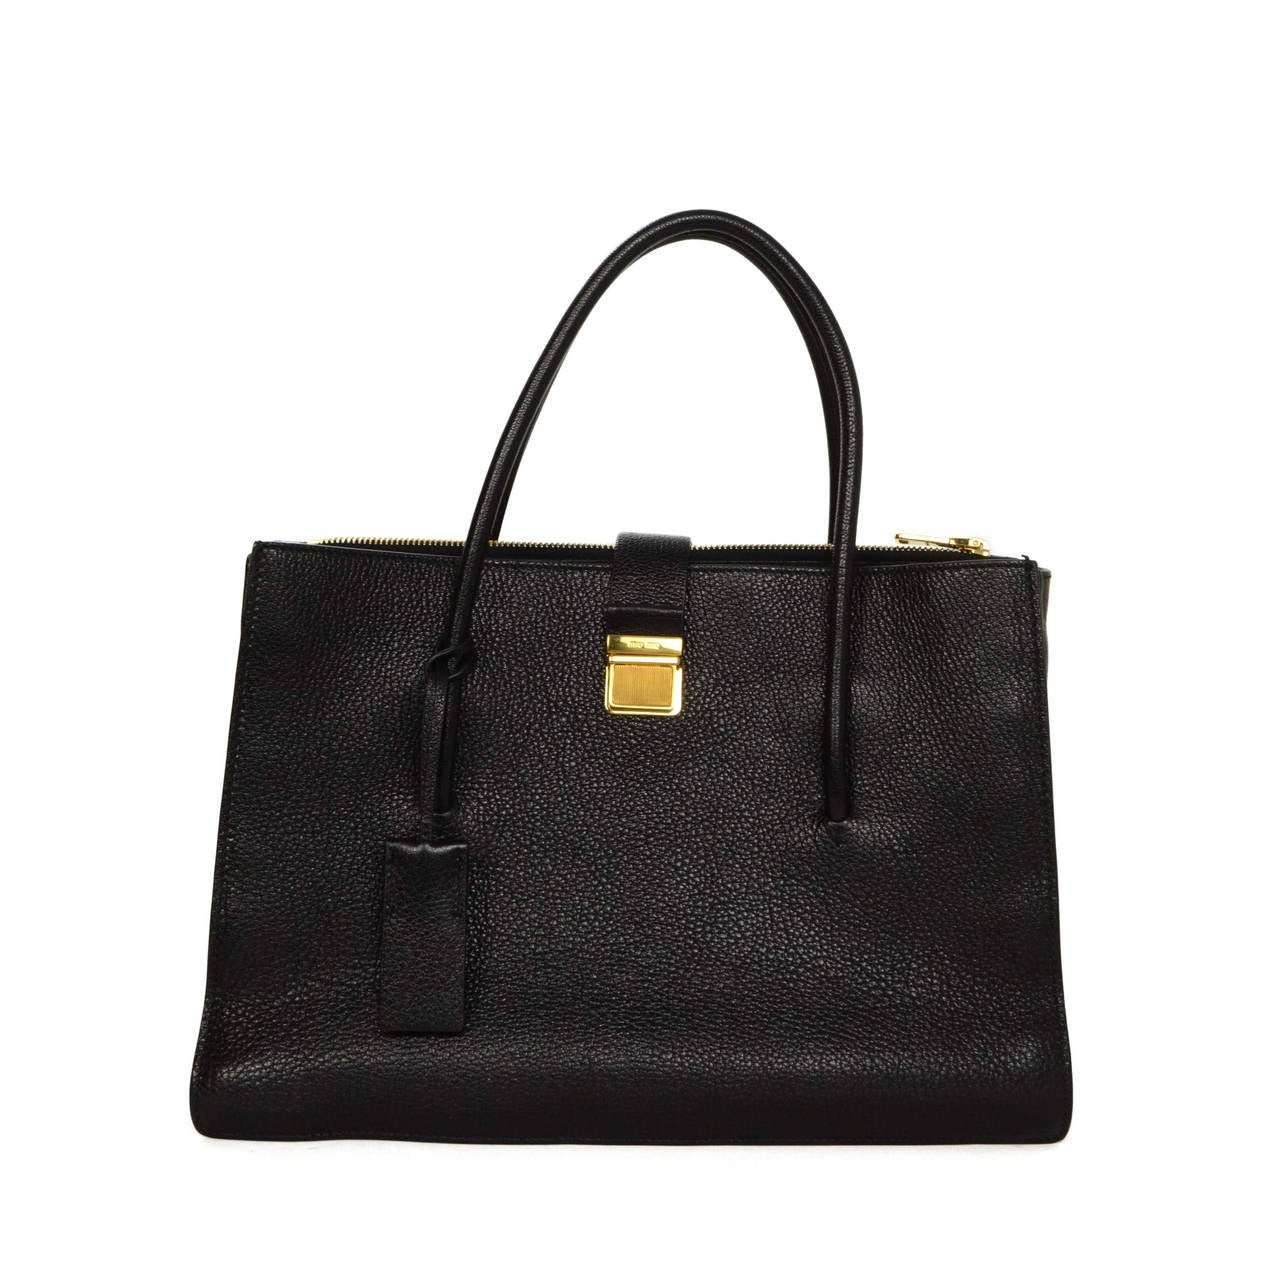 miu miu black leather madras tote bag ghw at 1stdibs. Black Bedroom Furniture Sets. Home Design Ideas